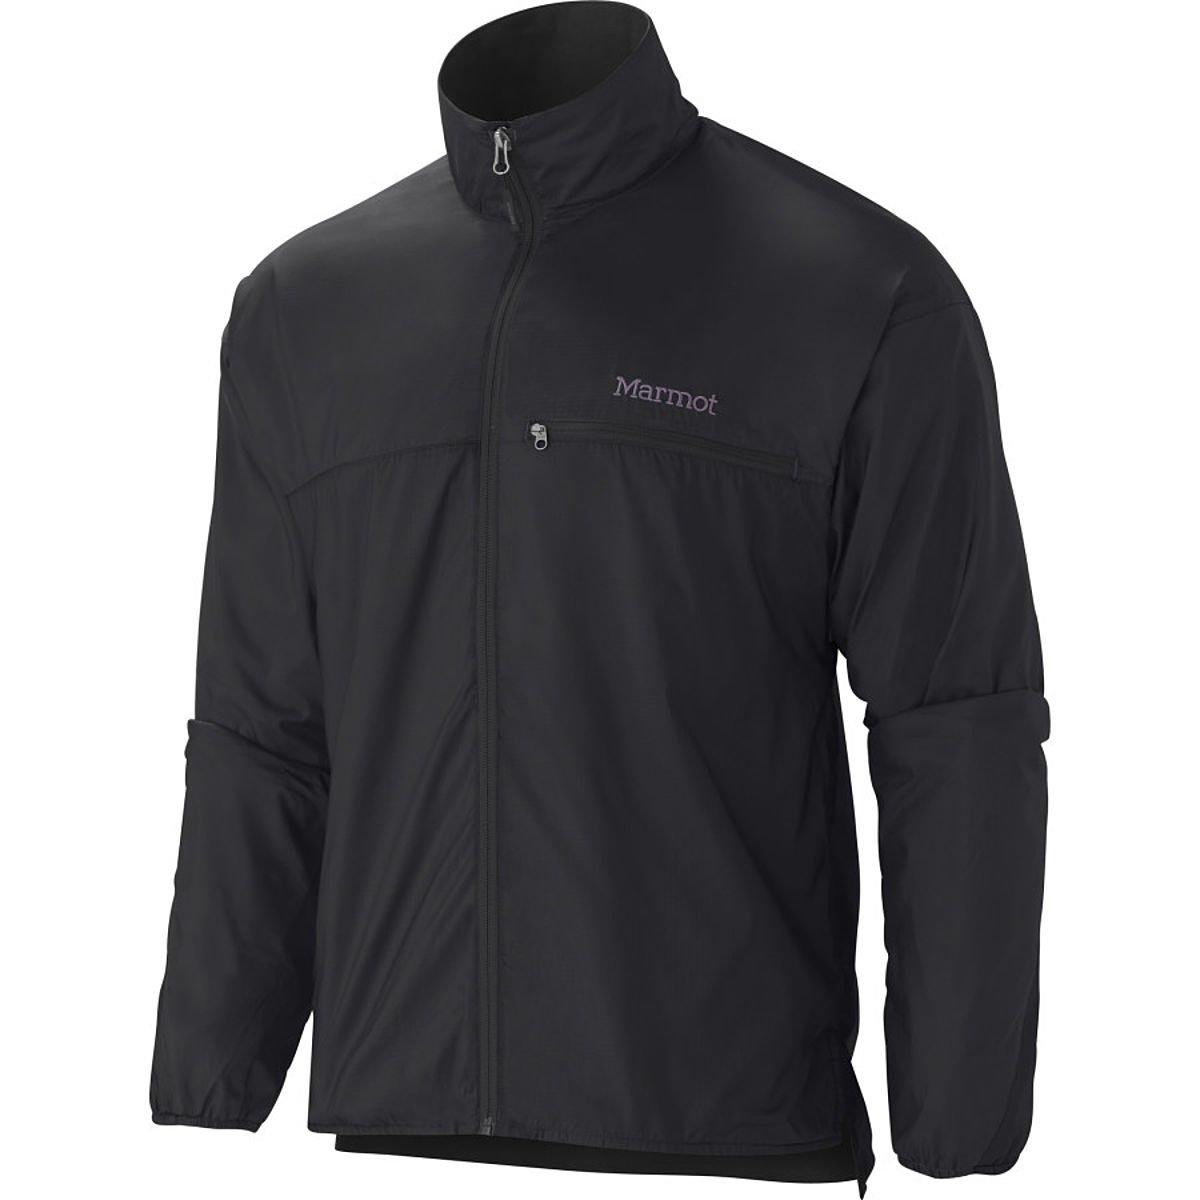 Marmot Men's Driclime Windshirt, Black, Large